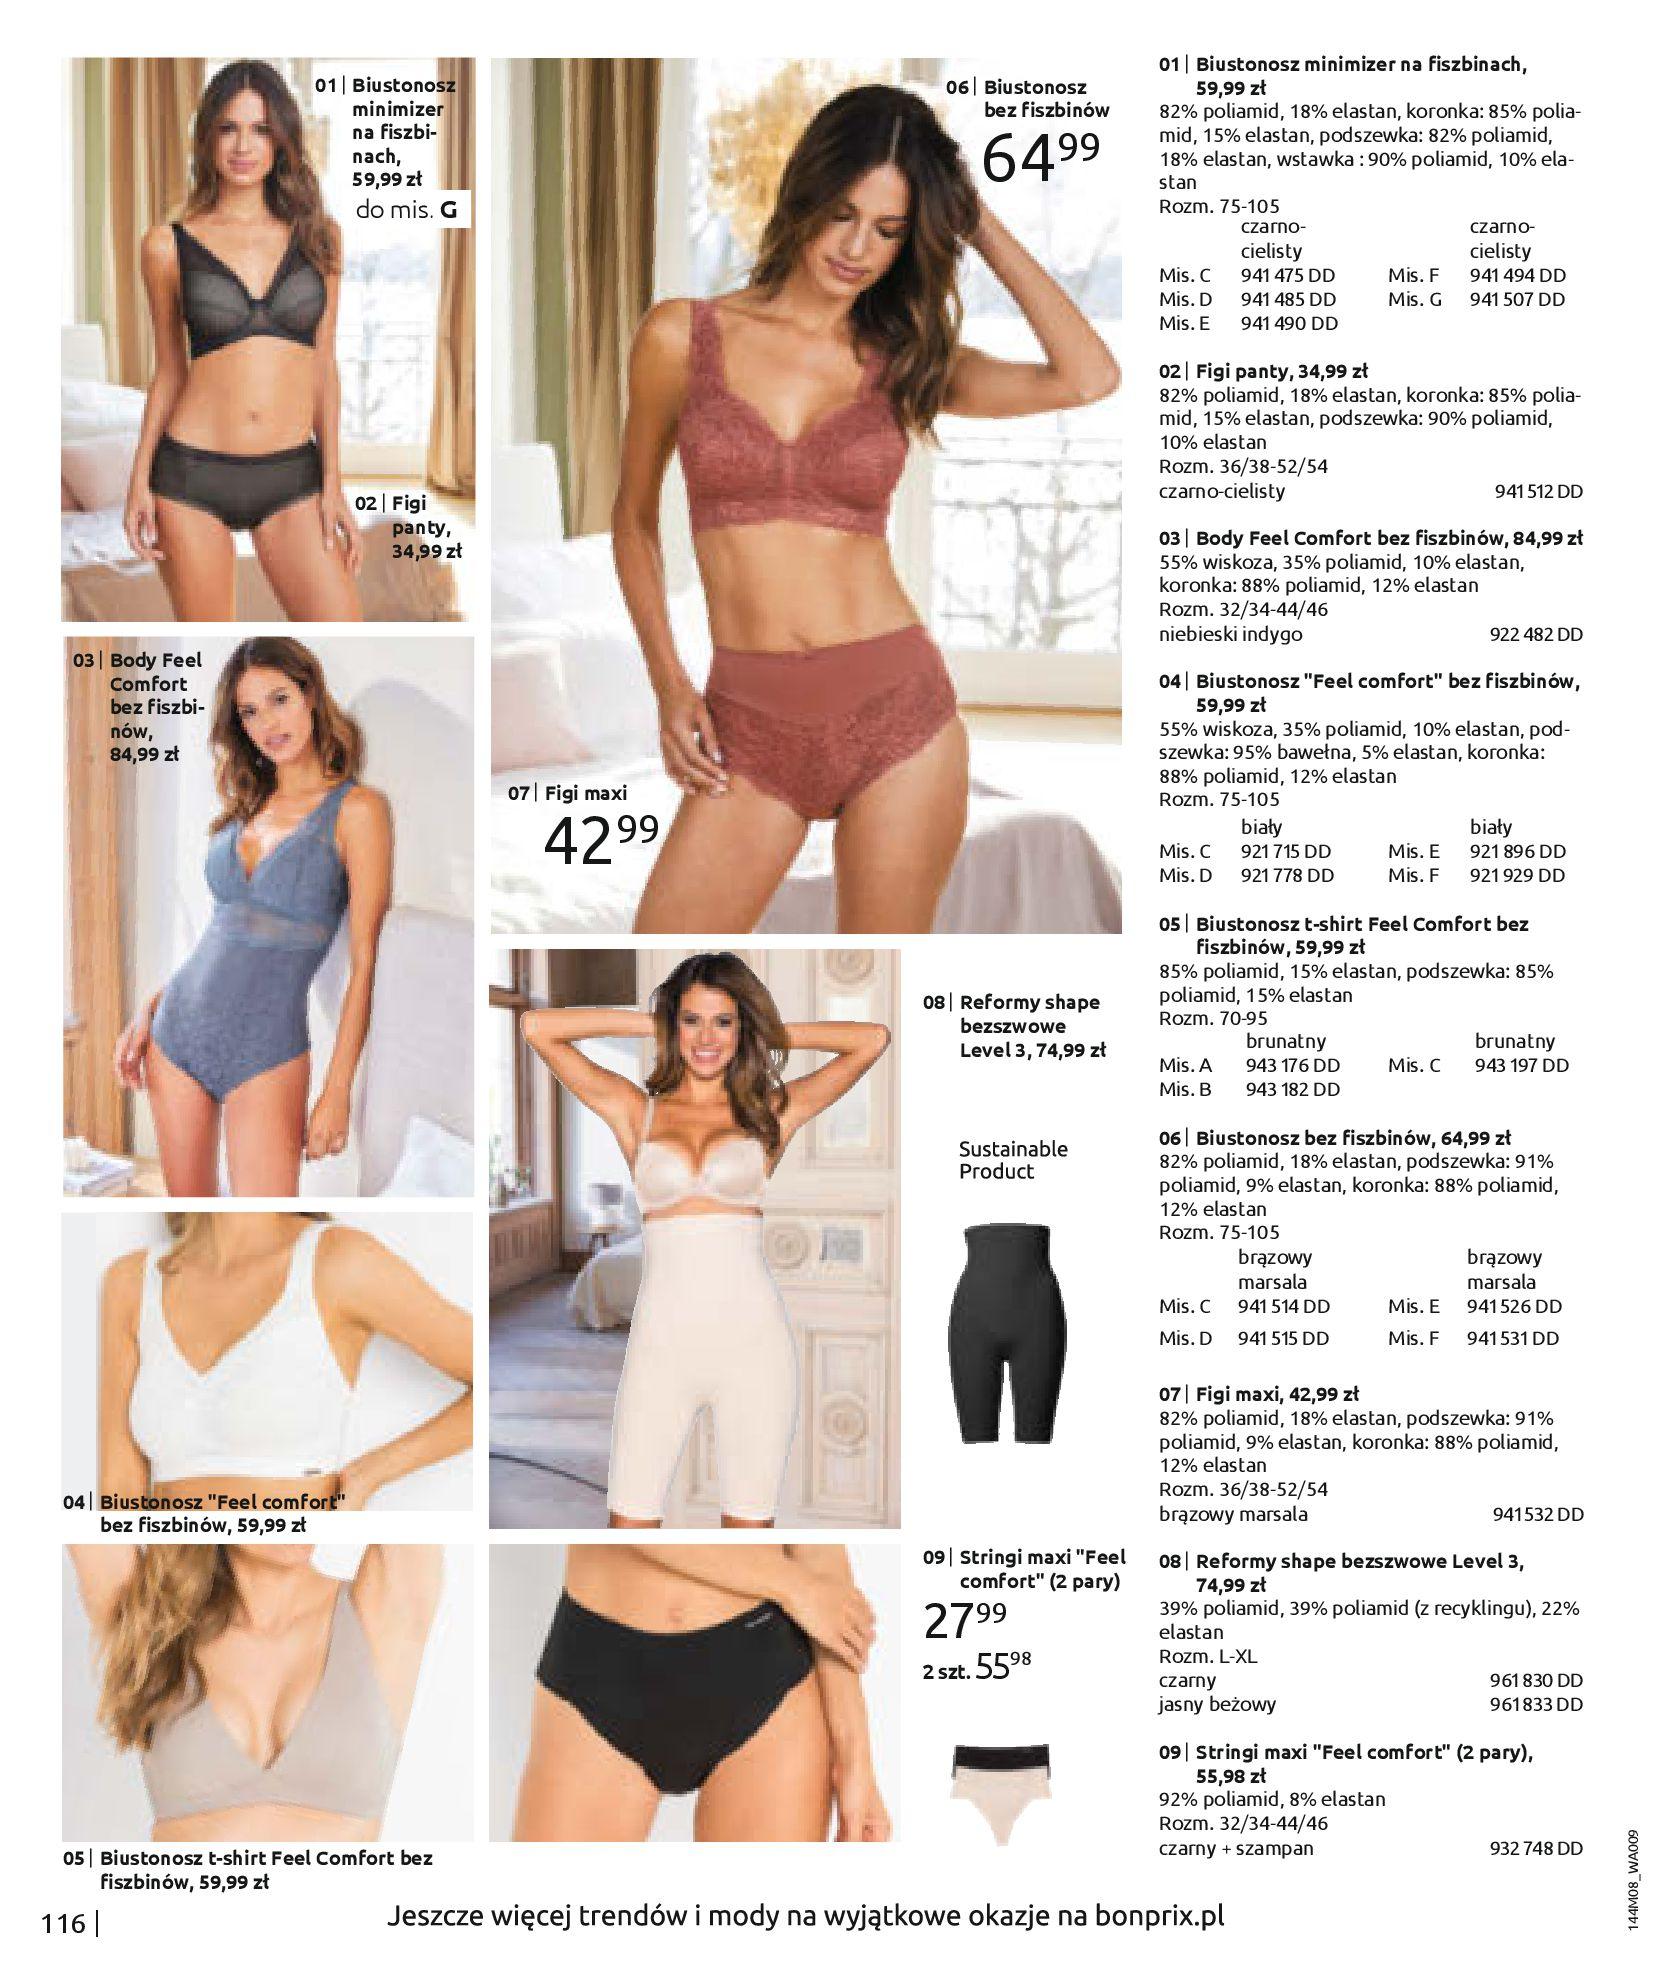 Gazetka Bonprix: Katalog Bonprix - denim 2021-09-09 page-118